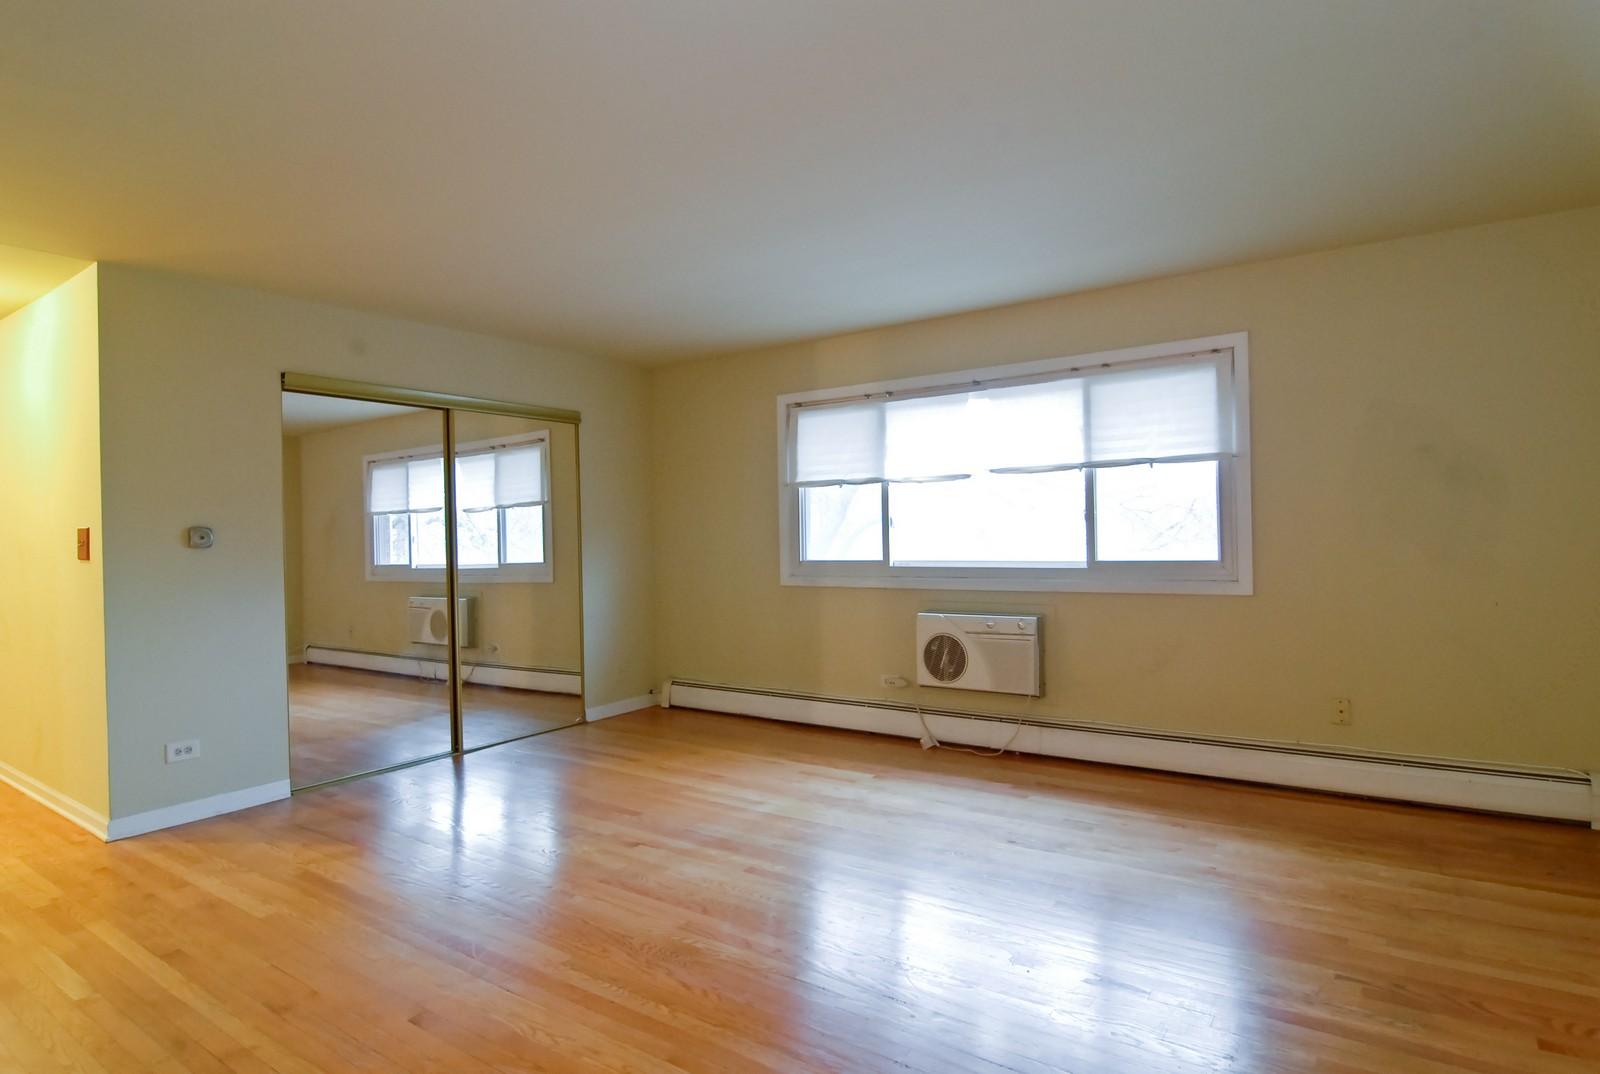 Real Estate Photography - 800 Washington Blvd, Unit 402, Oak Park, IL, 60302 - Living Room